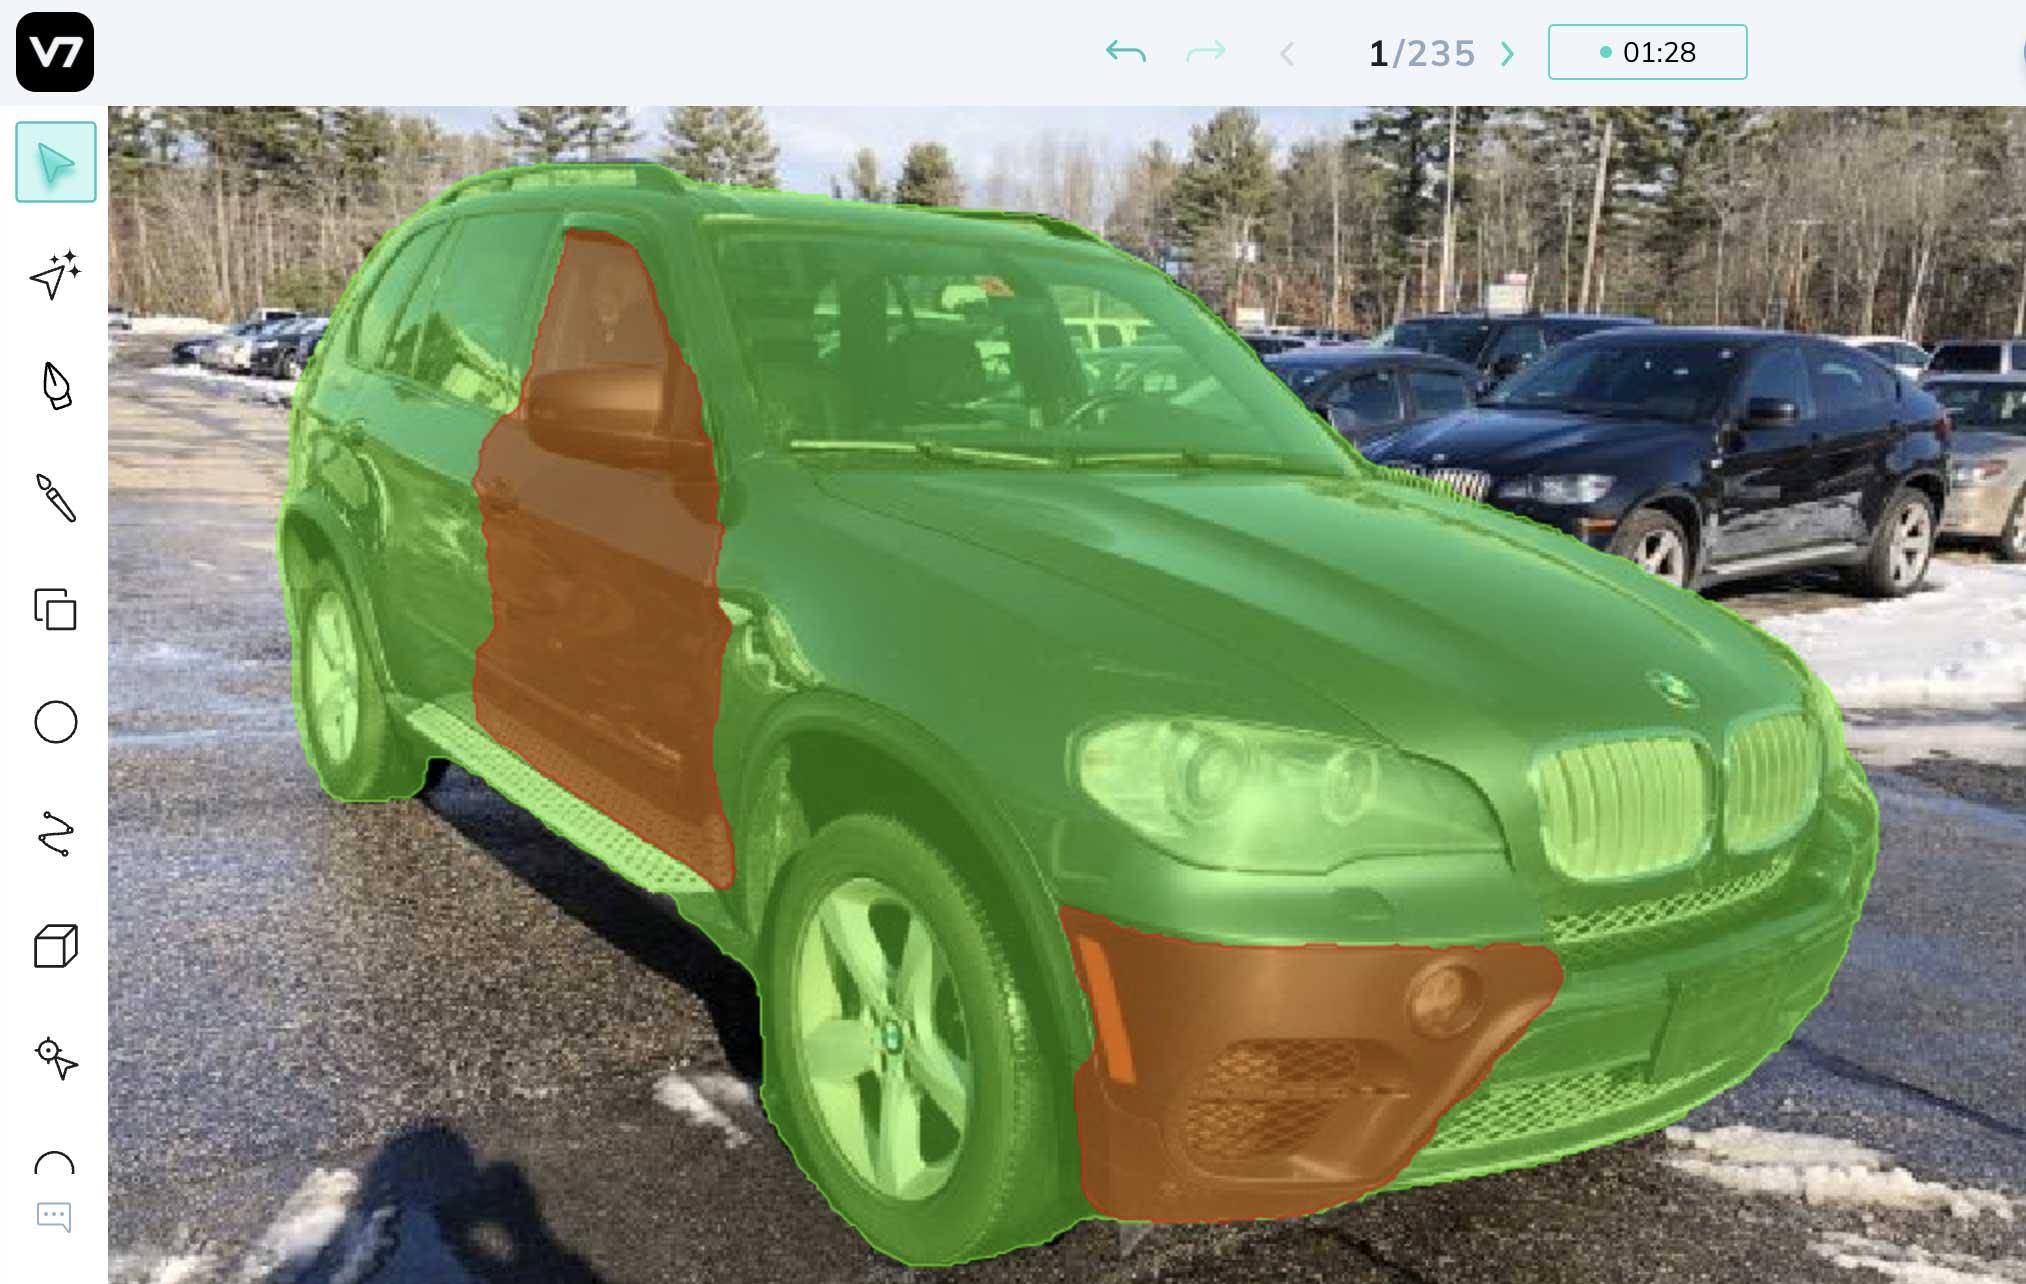 Car insurance damage detection AI